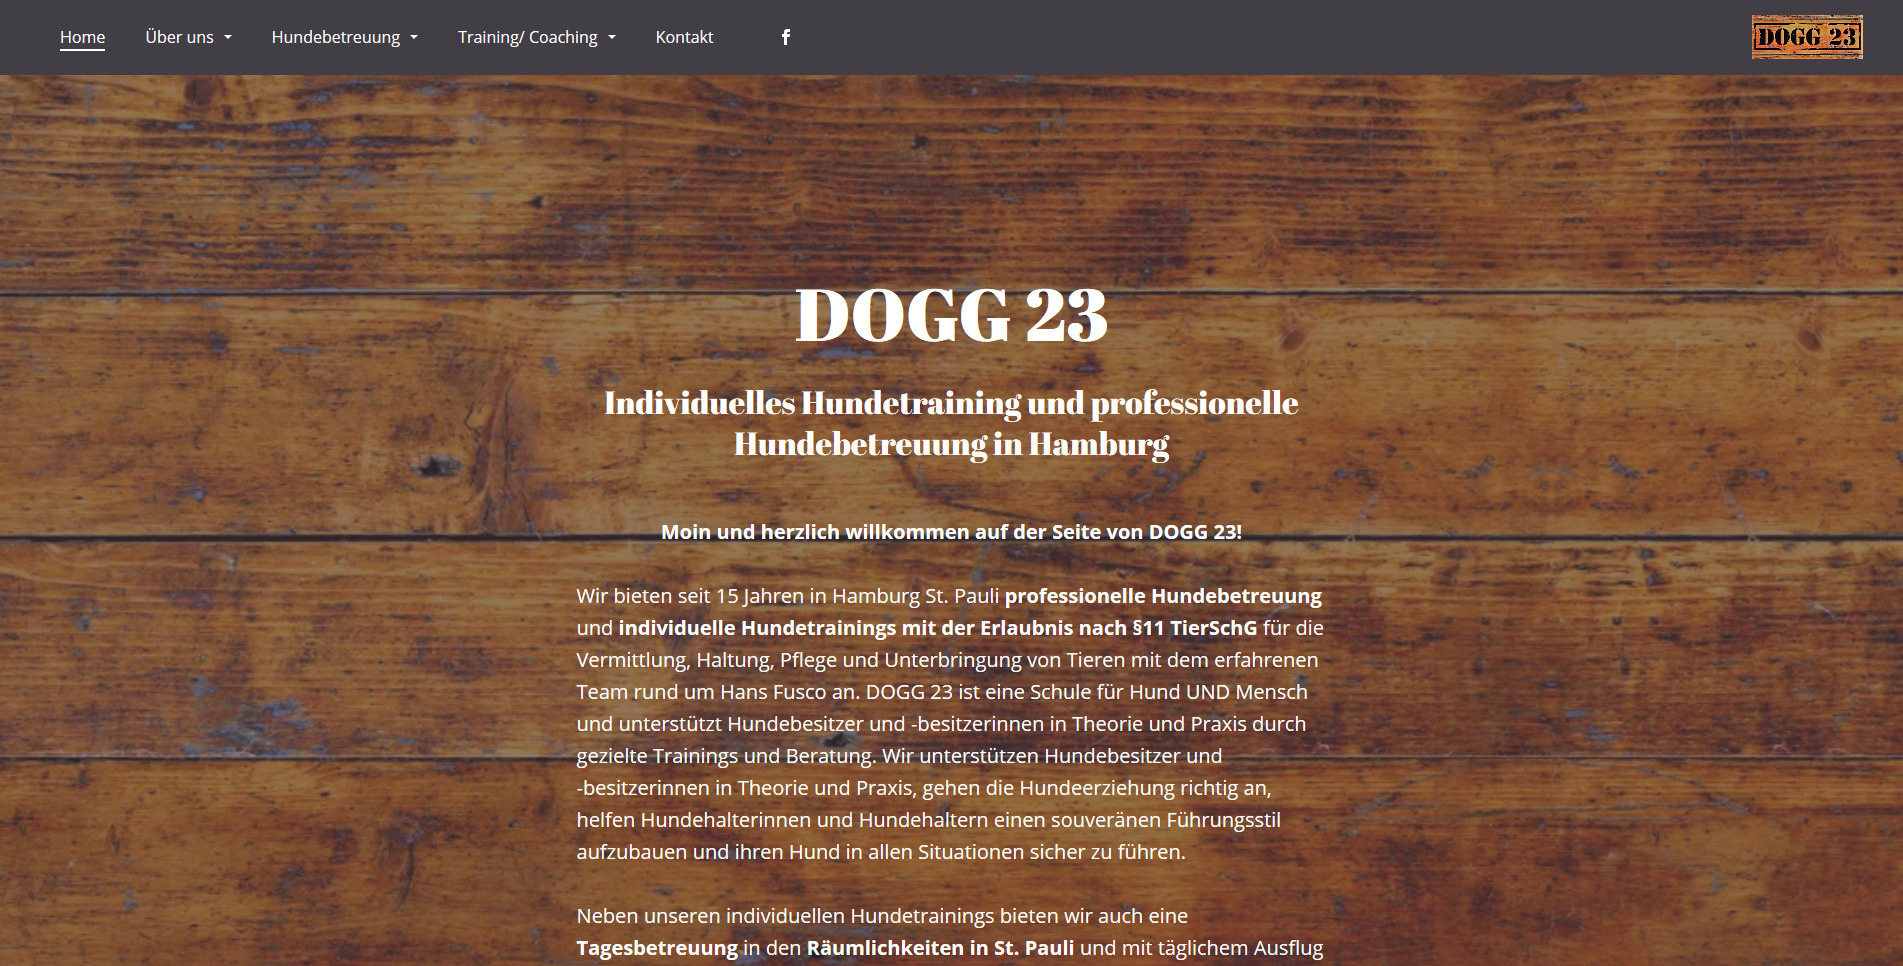 Freiraum - professionelle Hundebetreuung